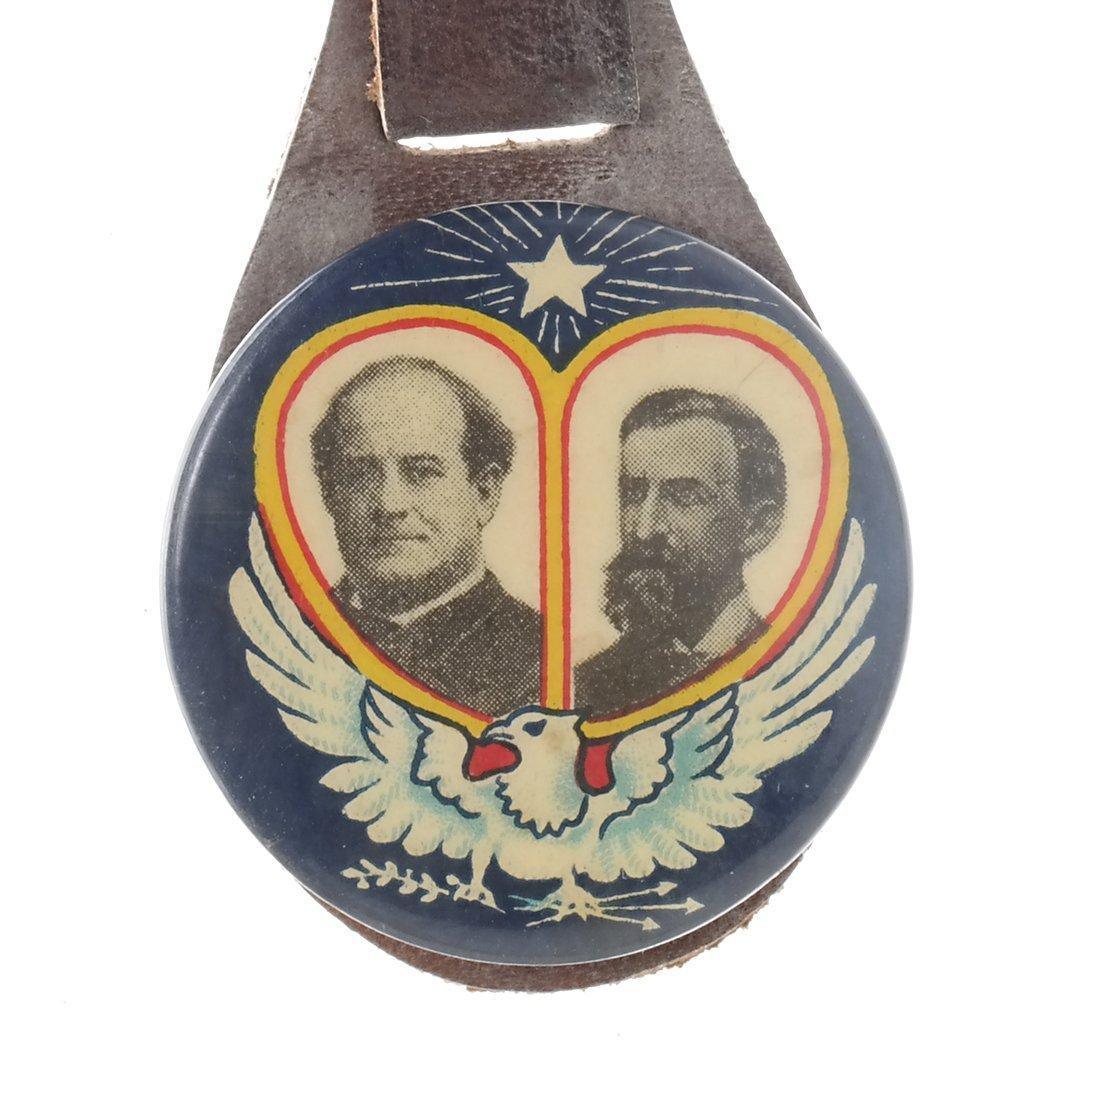 Bryan & Kern 1908 Jugate Fob